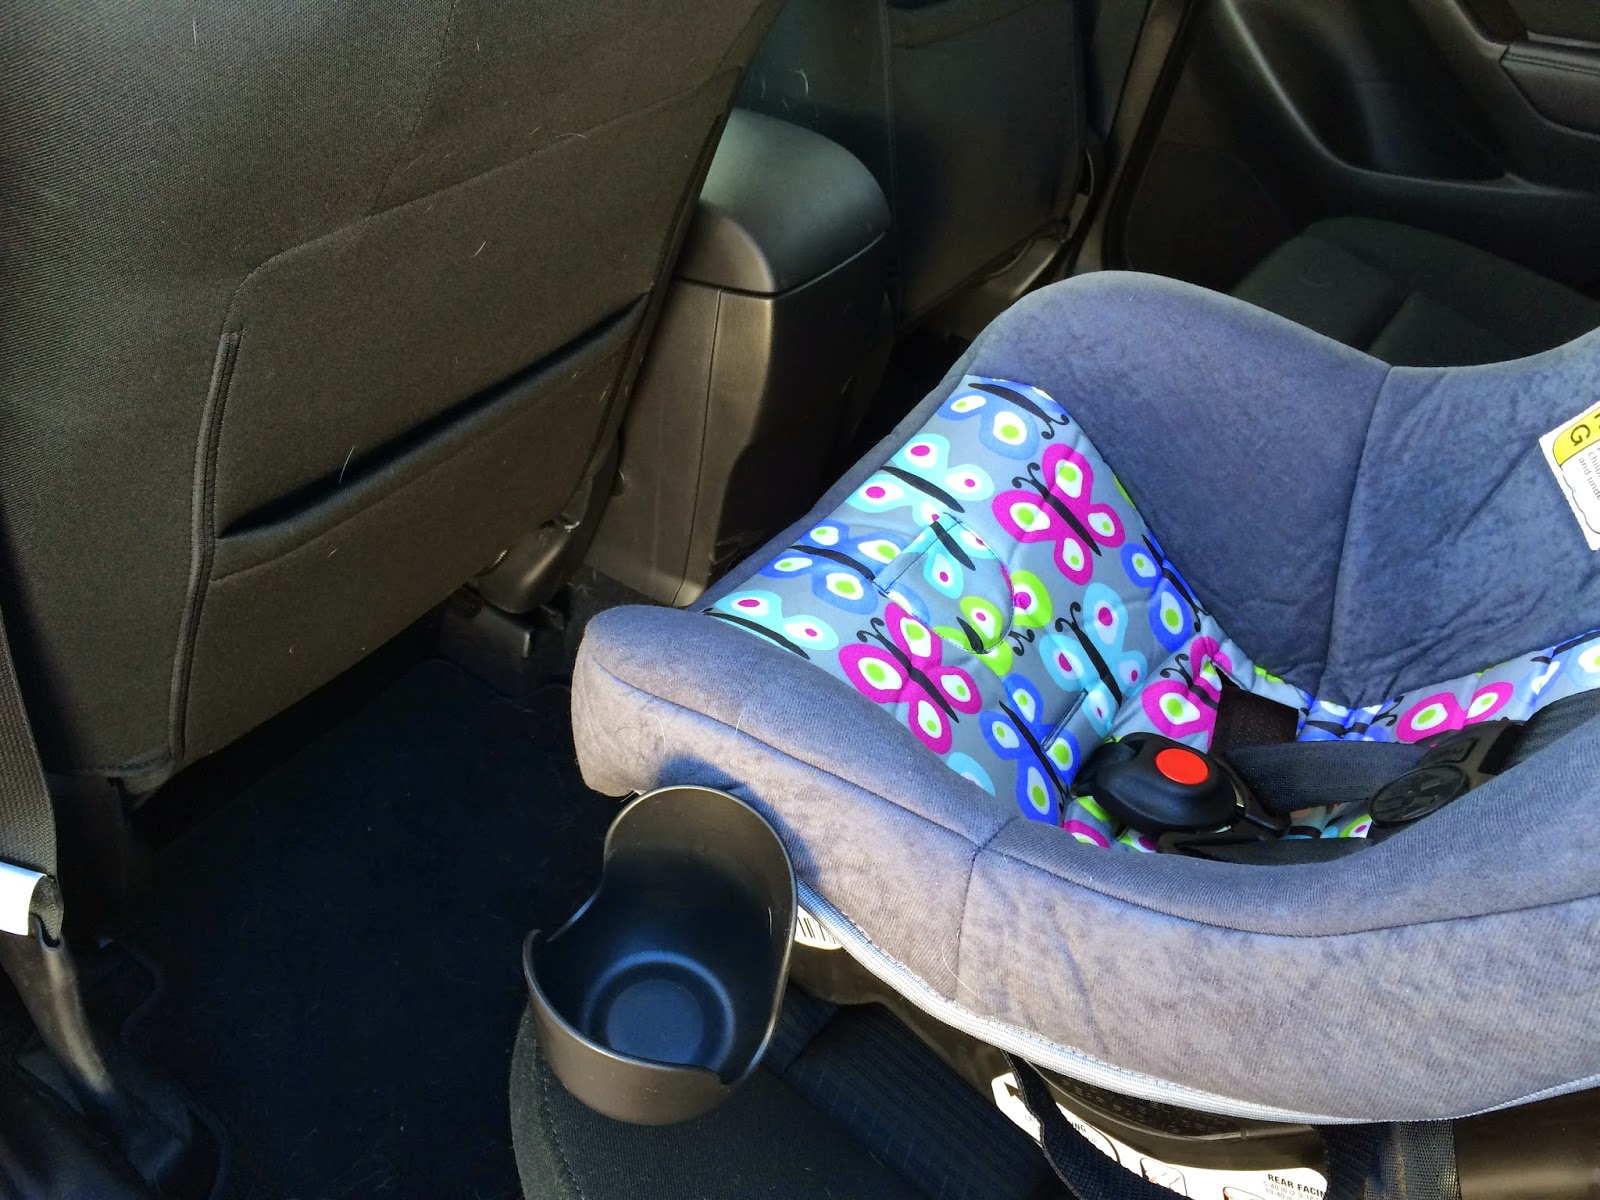 cosco scenera next car seat review giveaway mal smiles bloglovin. Black Bedroom Furniture Sets. Home Design Ideas